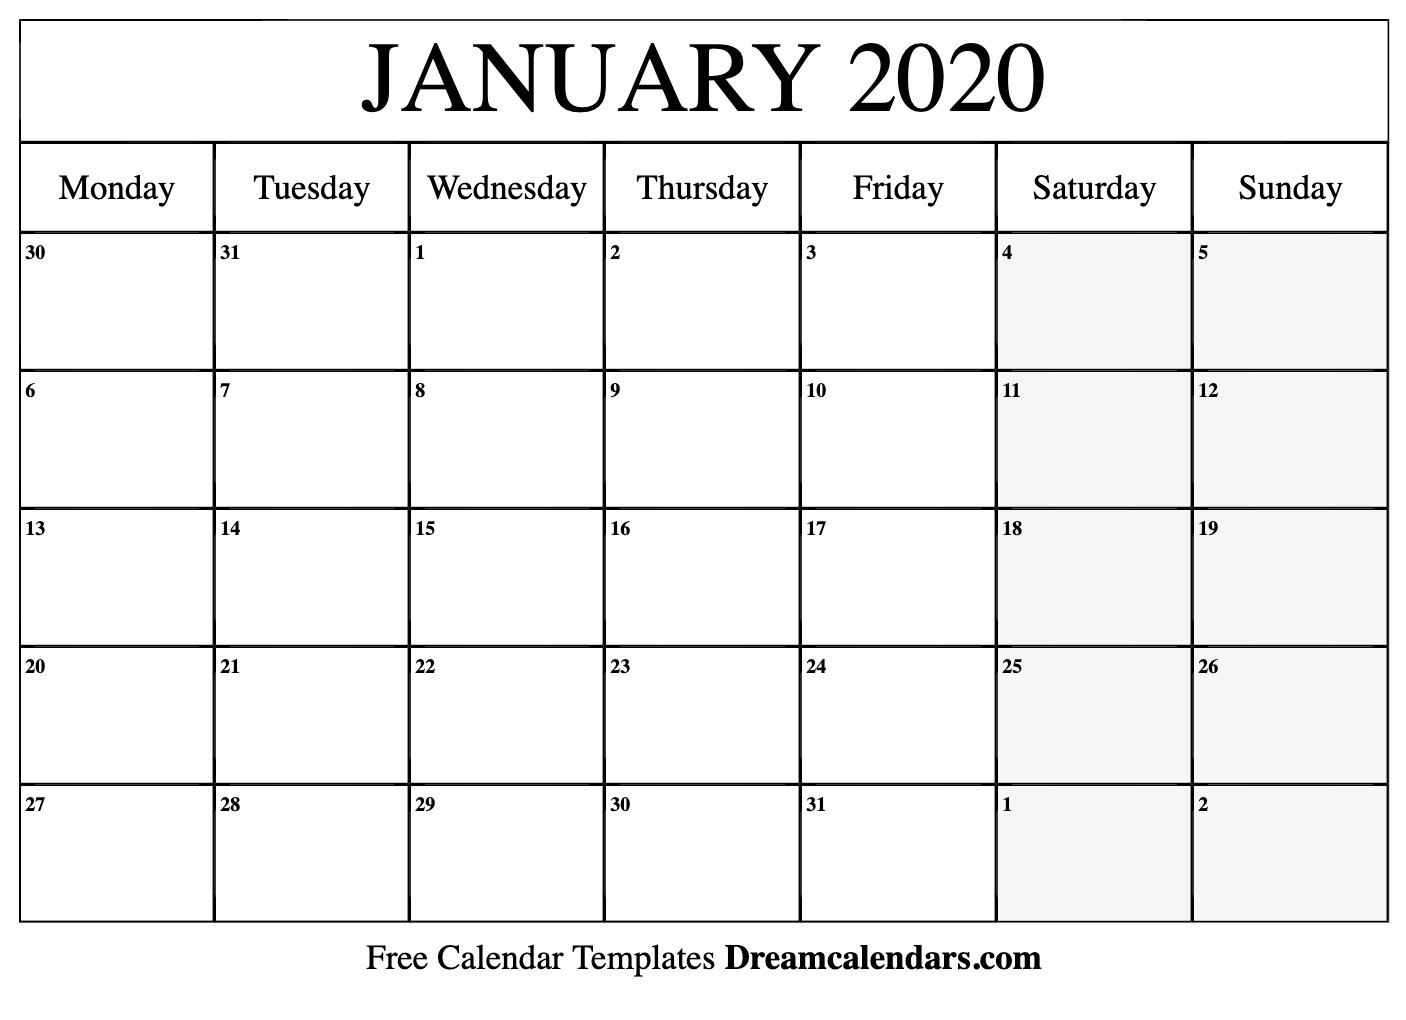 Printable January 2020 Calendar-Free Printable January 2020 Calendar Template